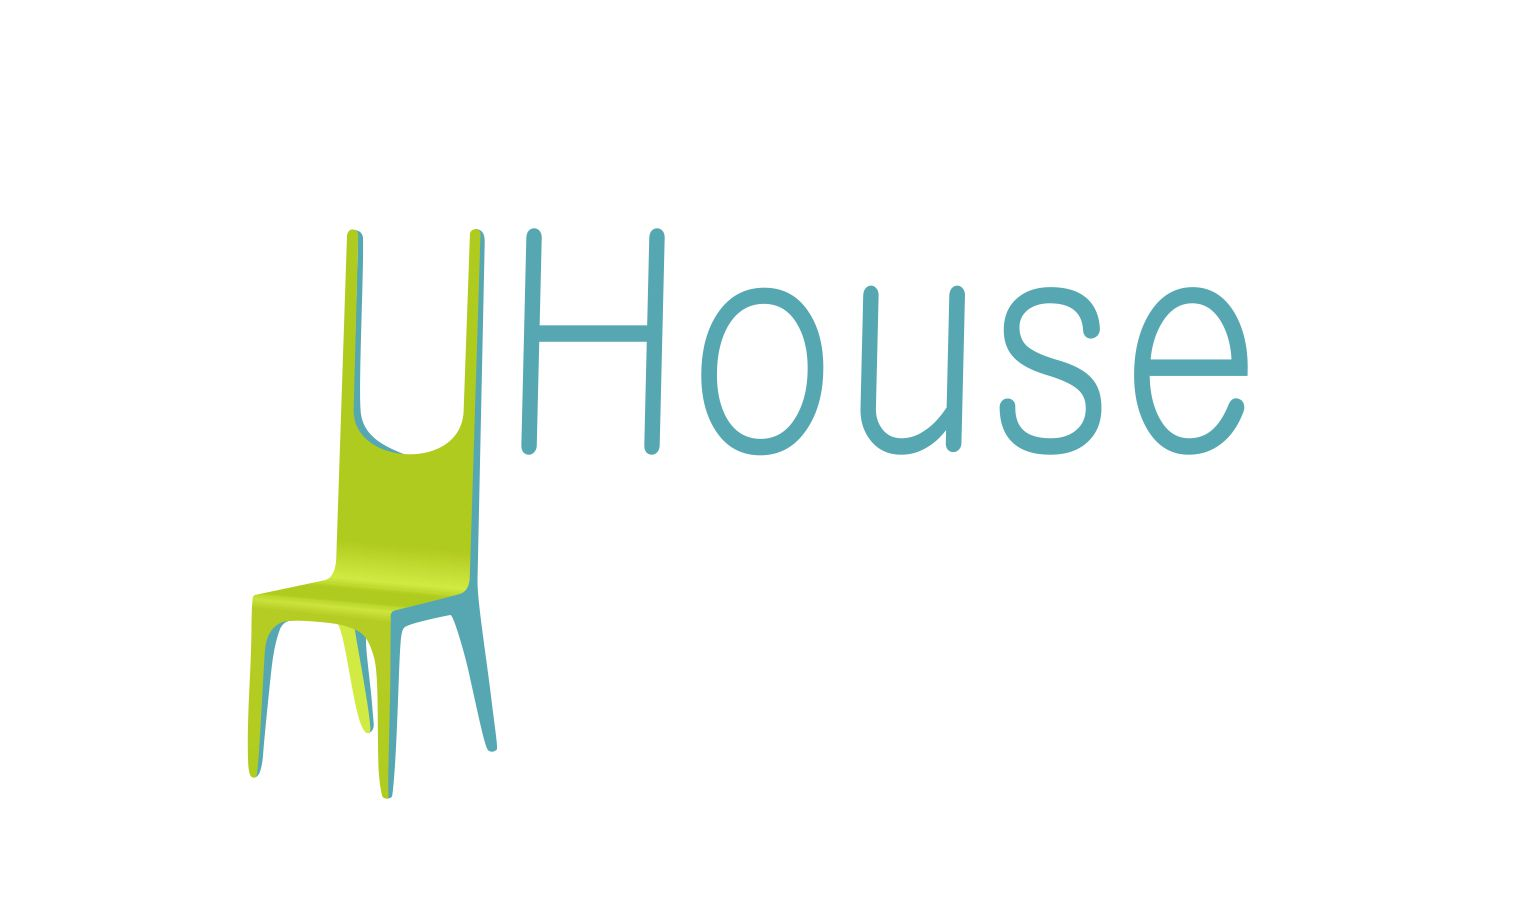 Создаем Лого для Интерьер портала фото f_28051573edbb48f1.jpg